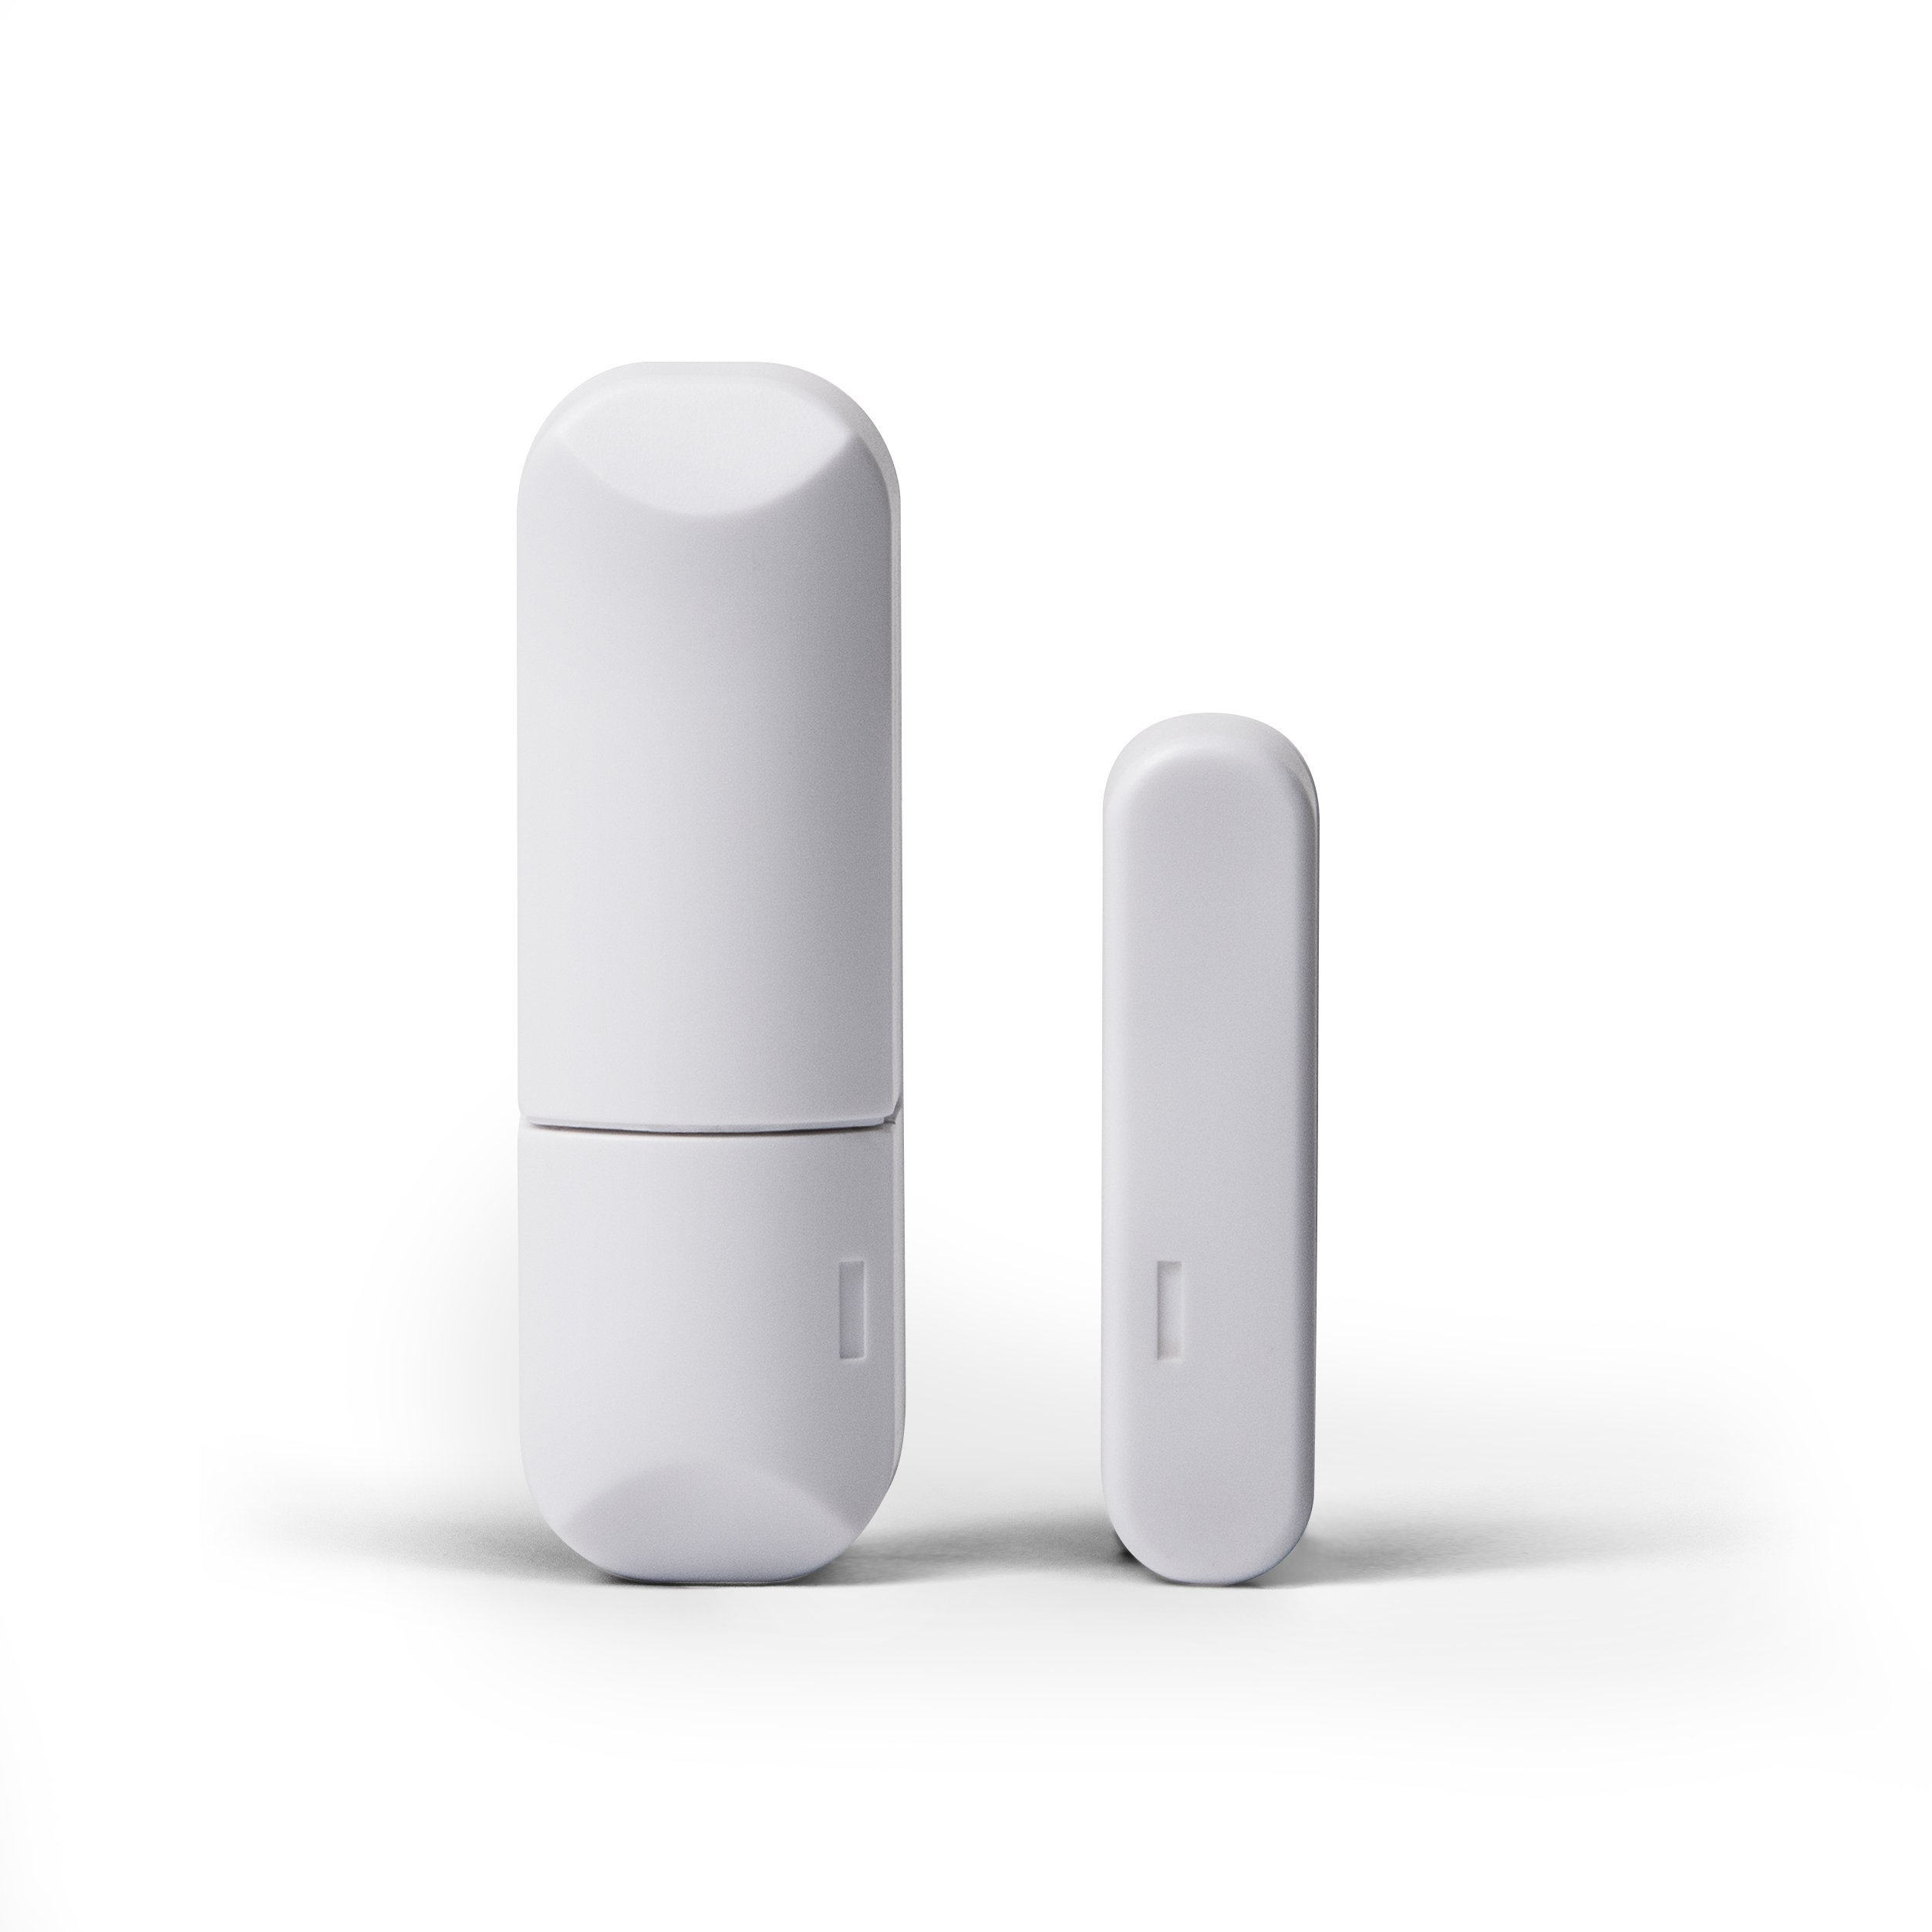 Iris Contact Sensor by Iris Smart Home Management